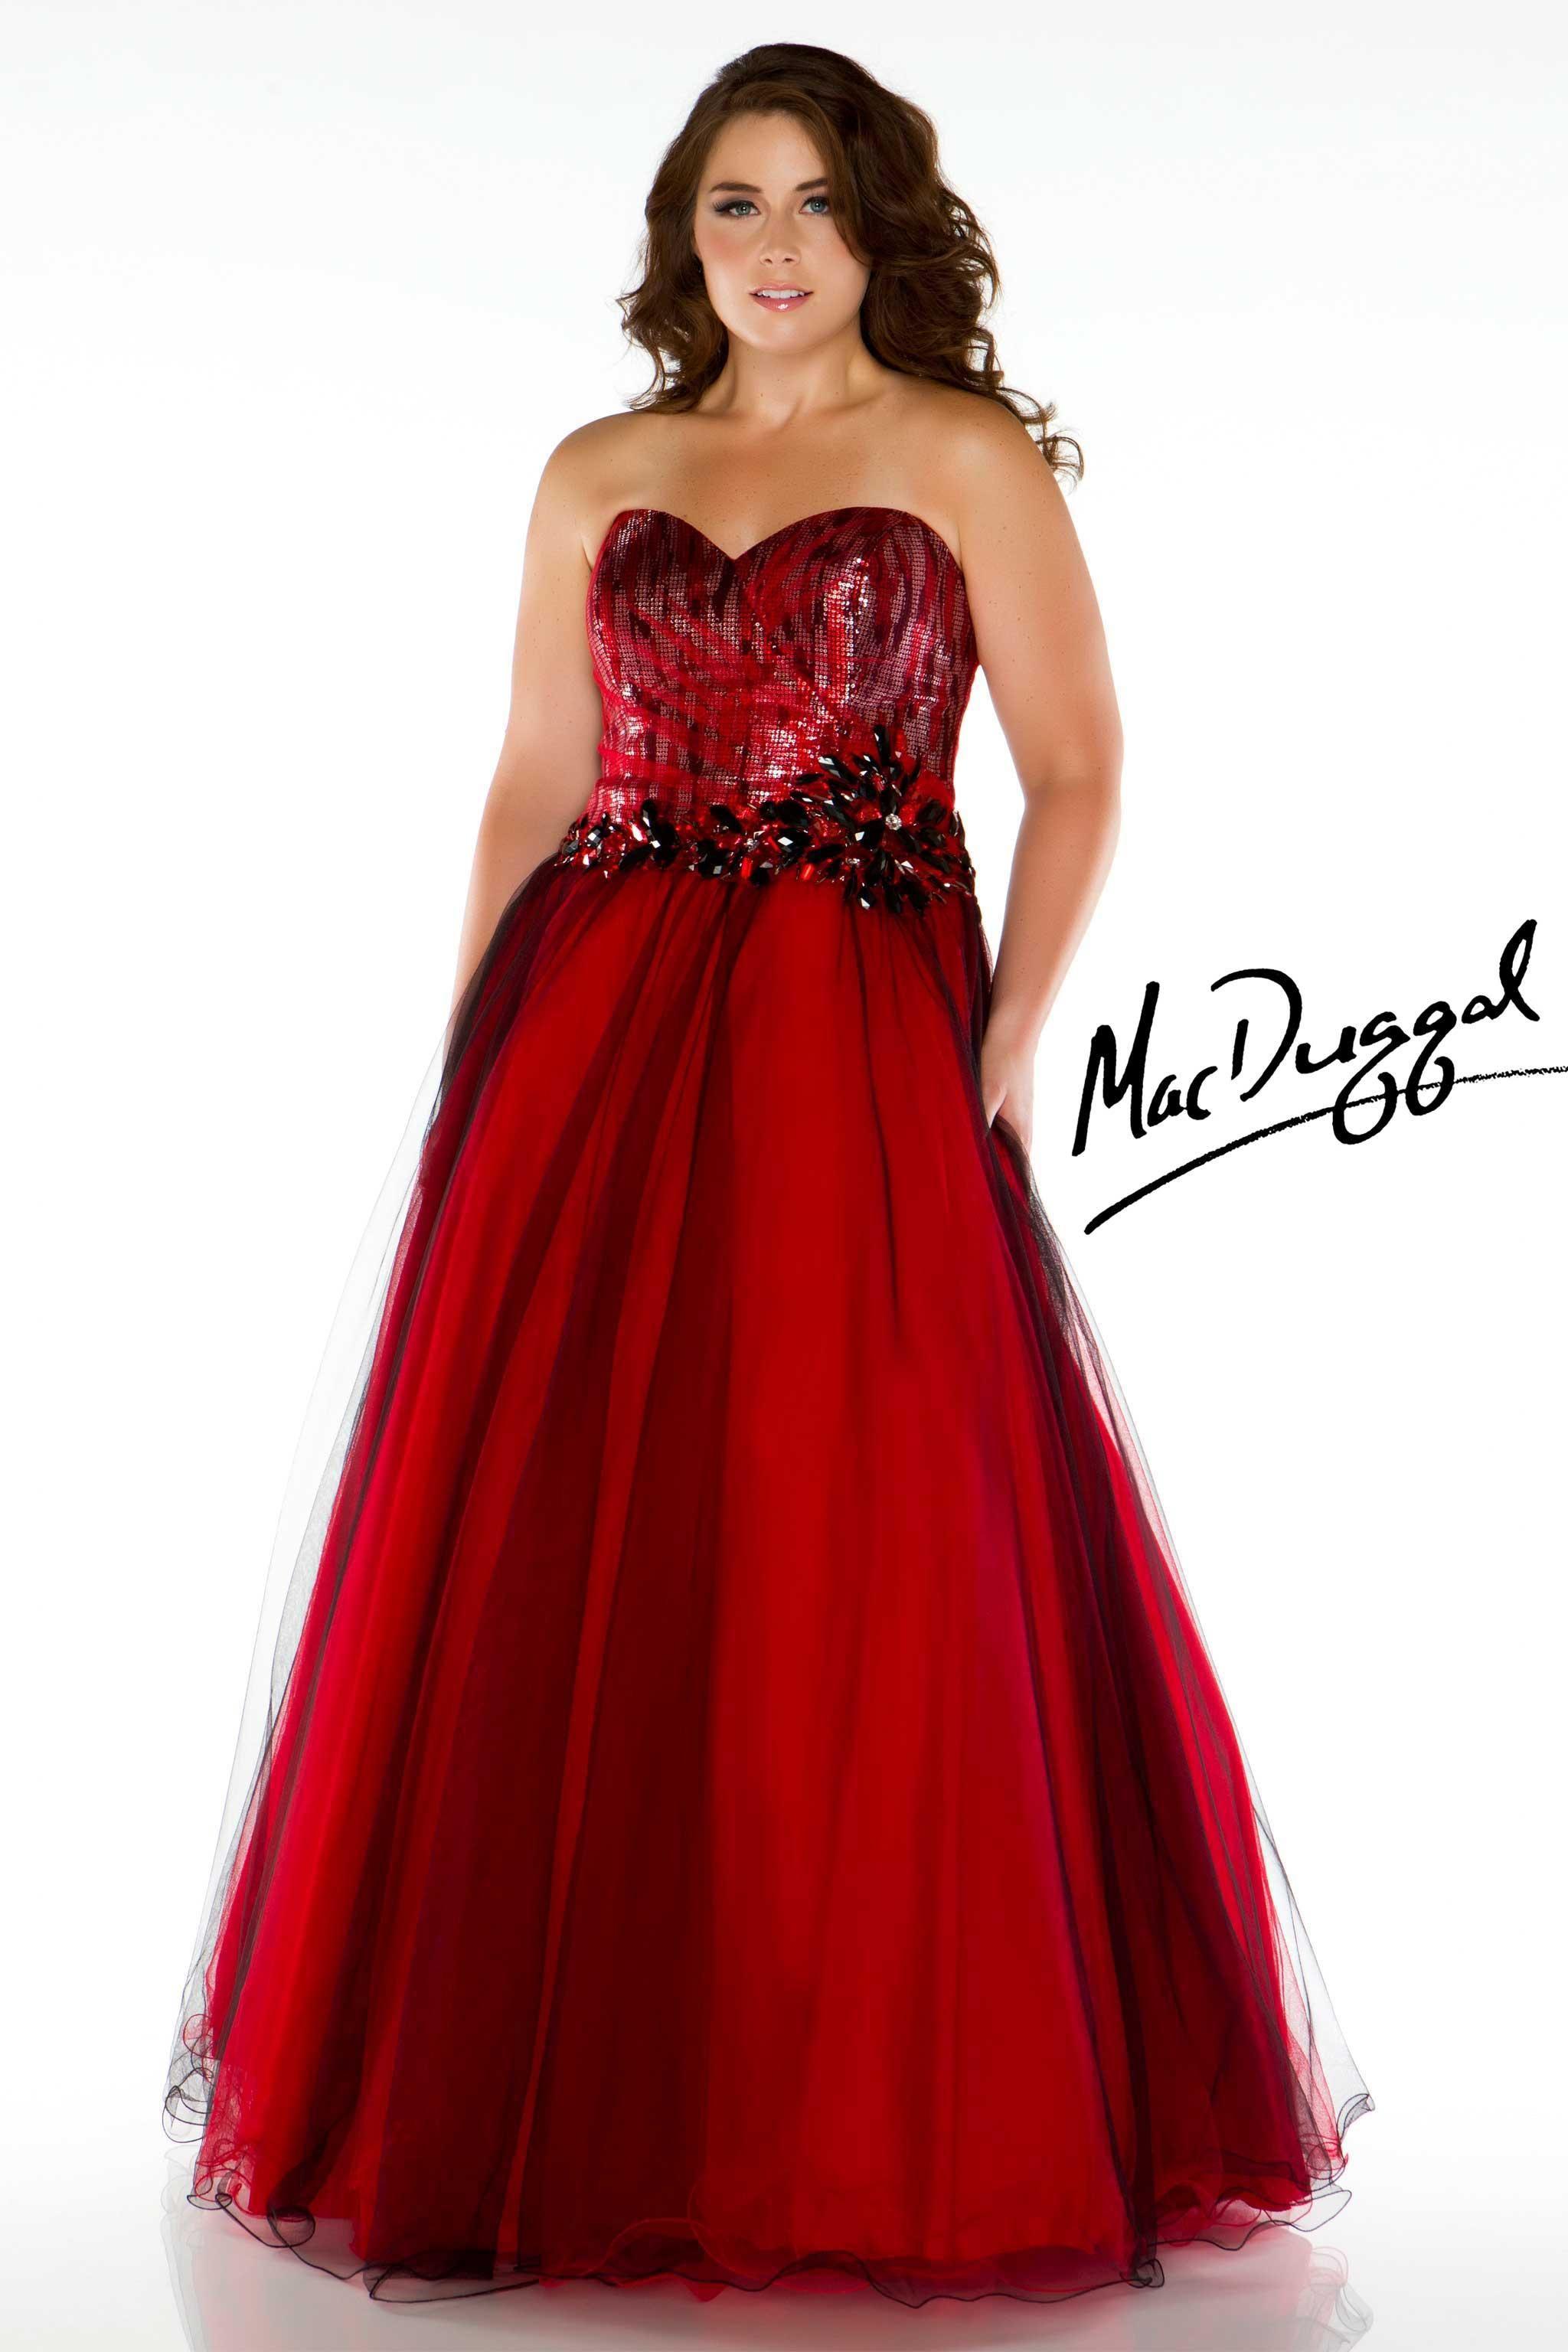 Strapless Red Plus Size Prom Dress  Mac Duggal  Prom